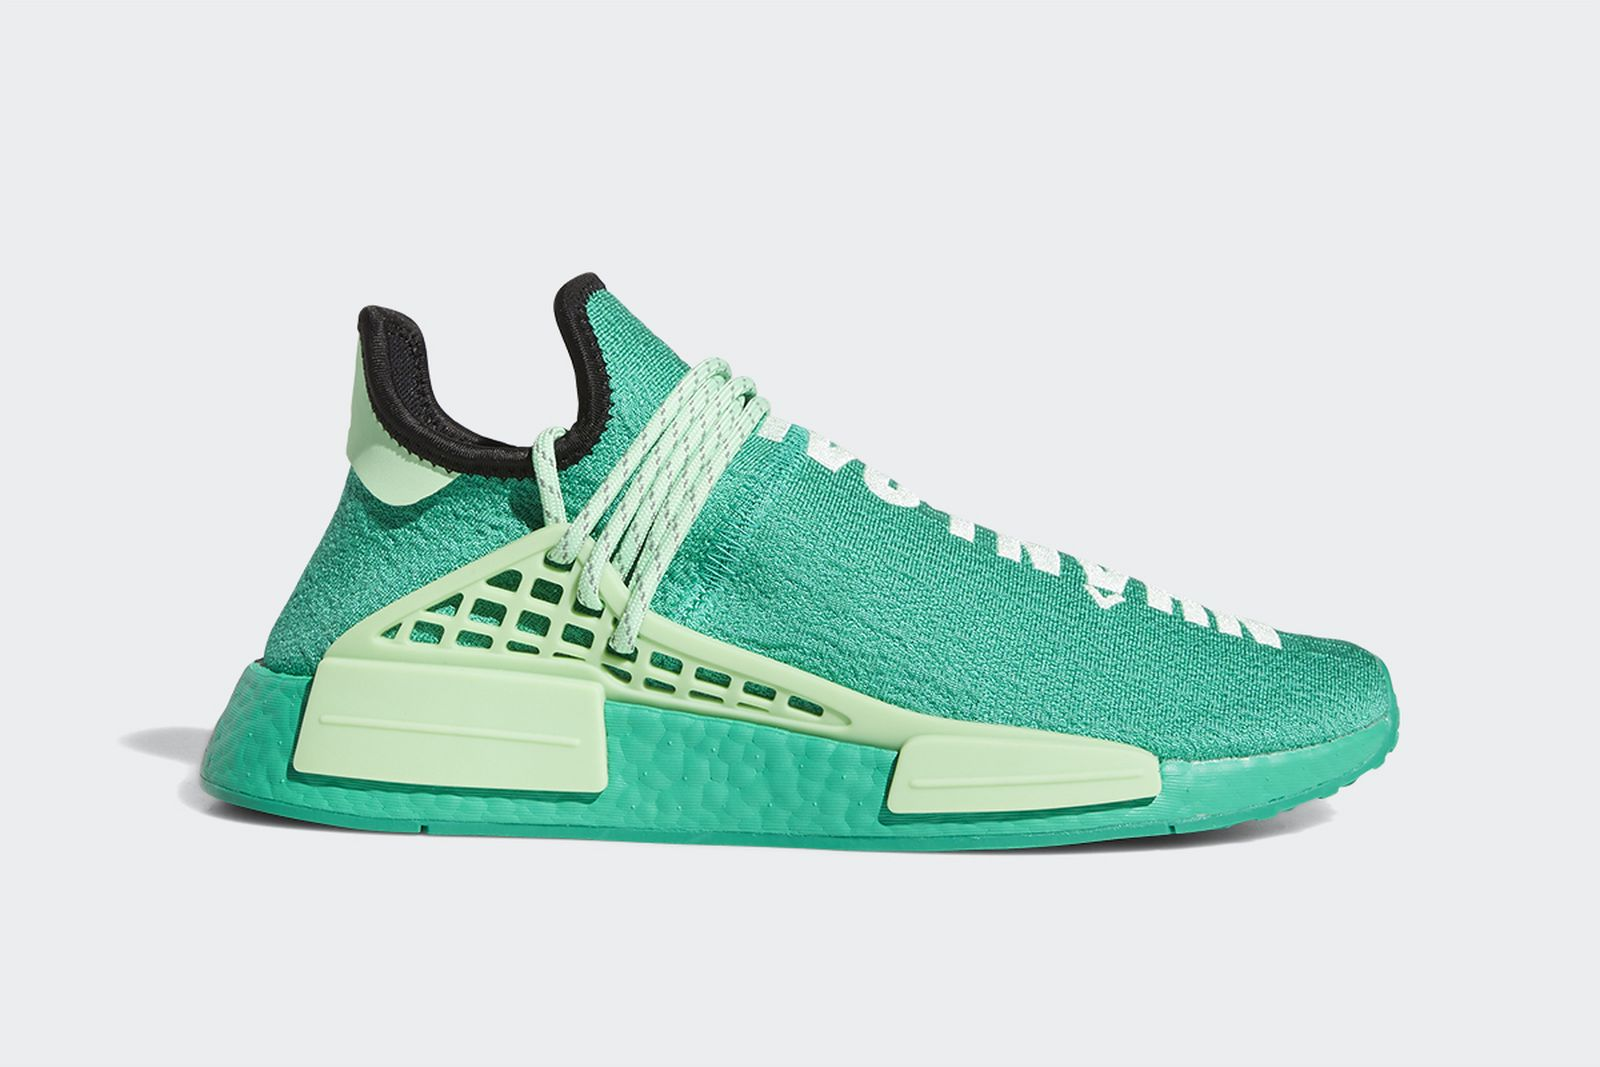 pharrell-adidas-pw-hu-nmd-green-release-date-price-01